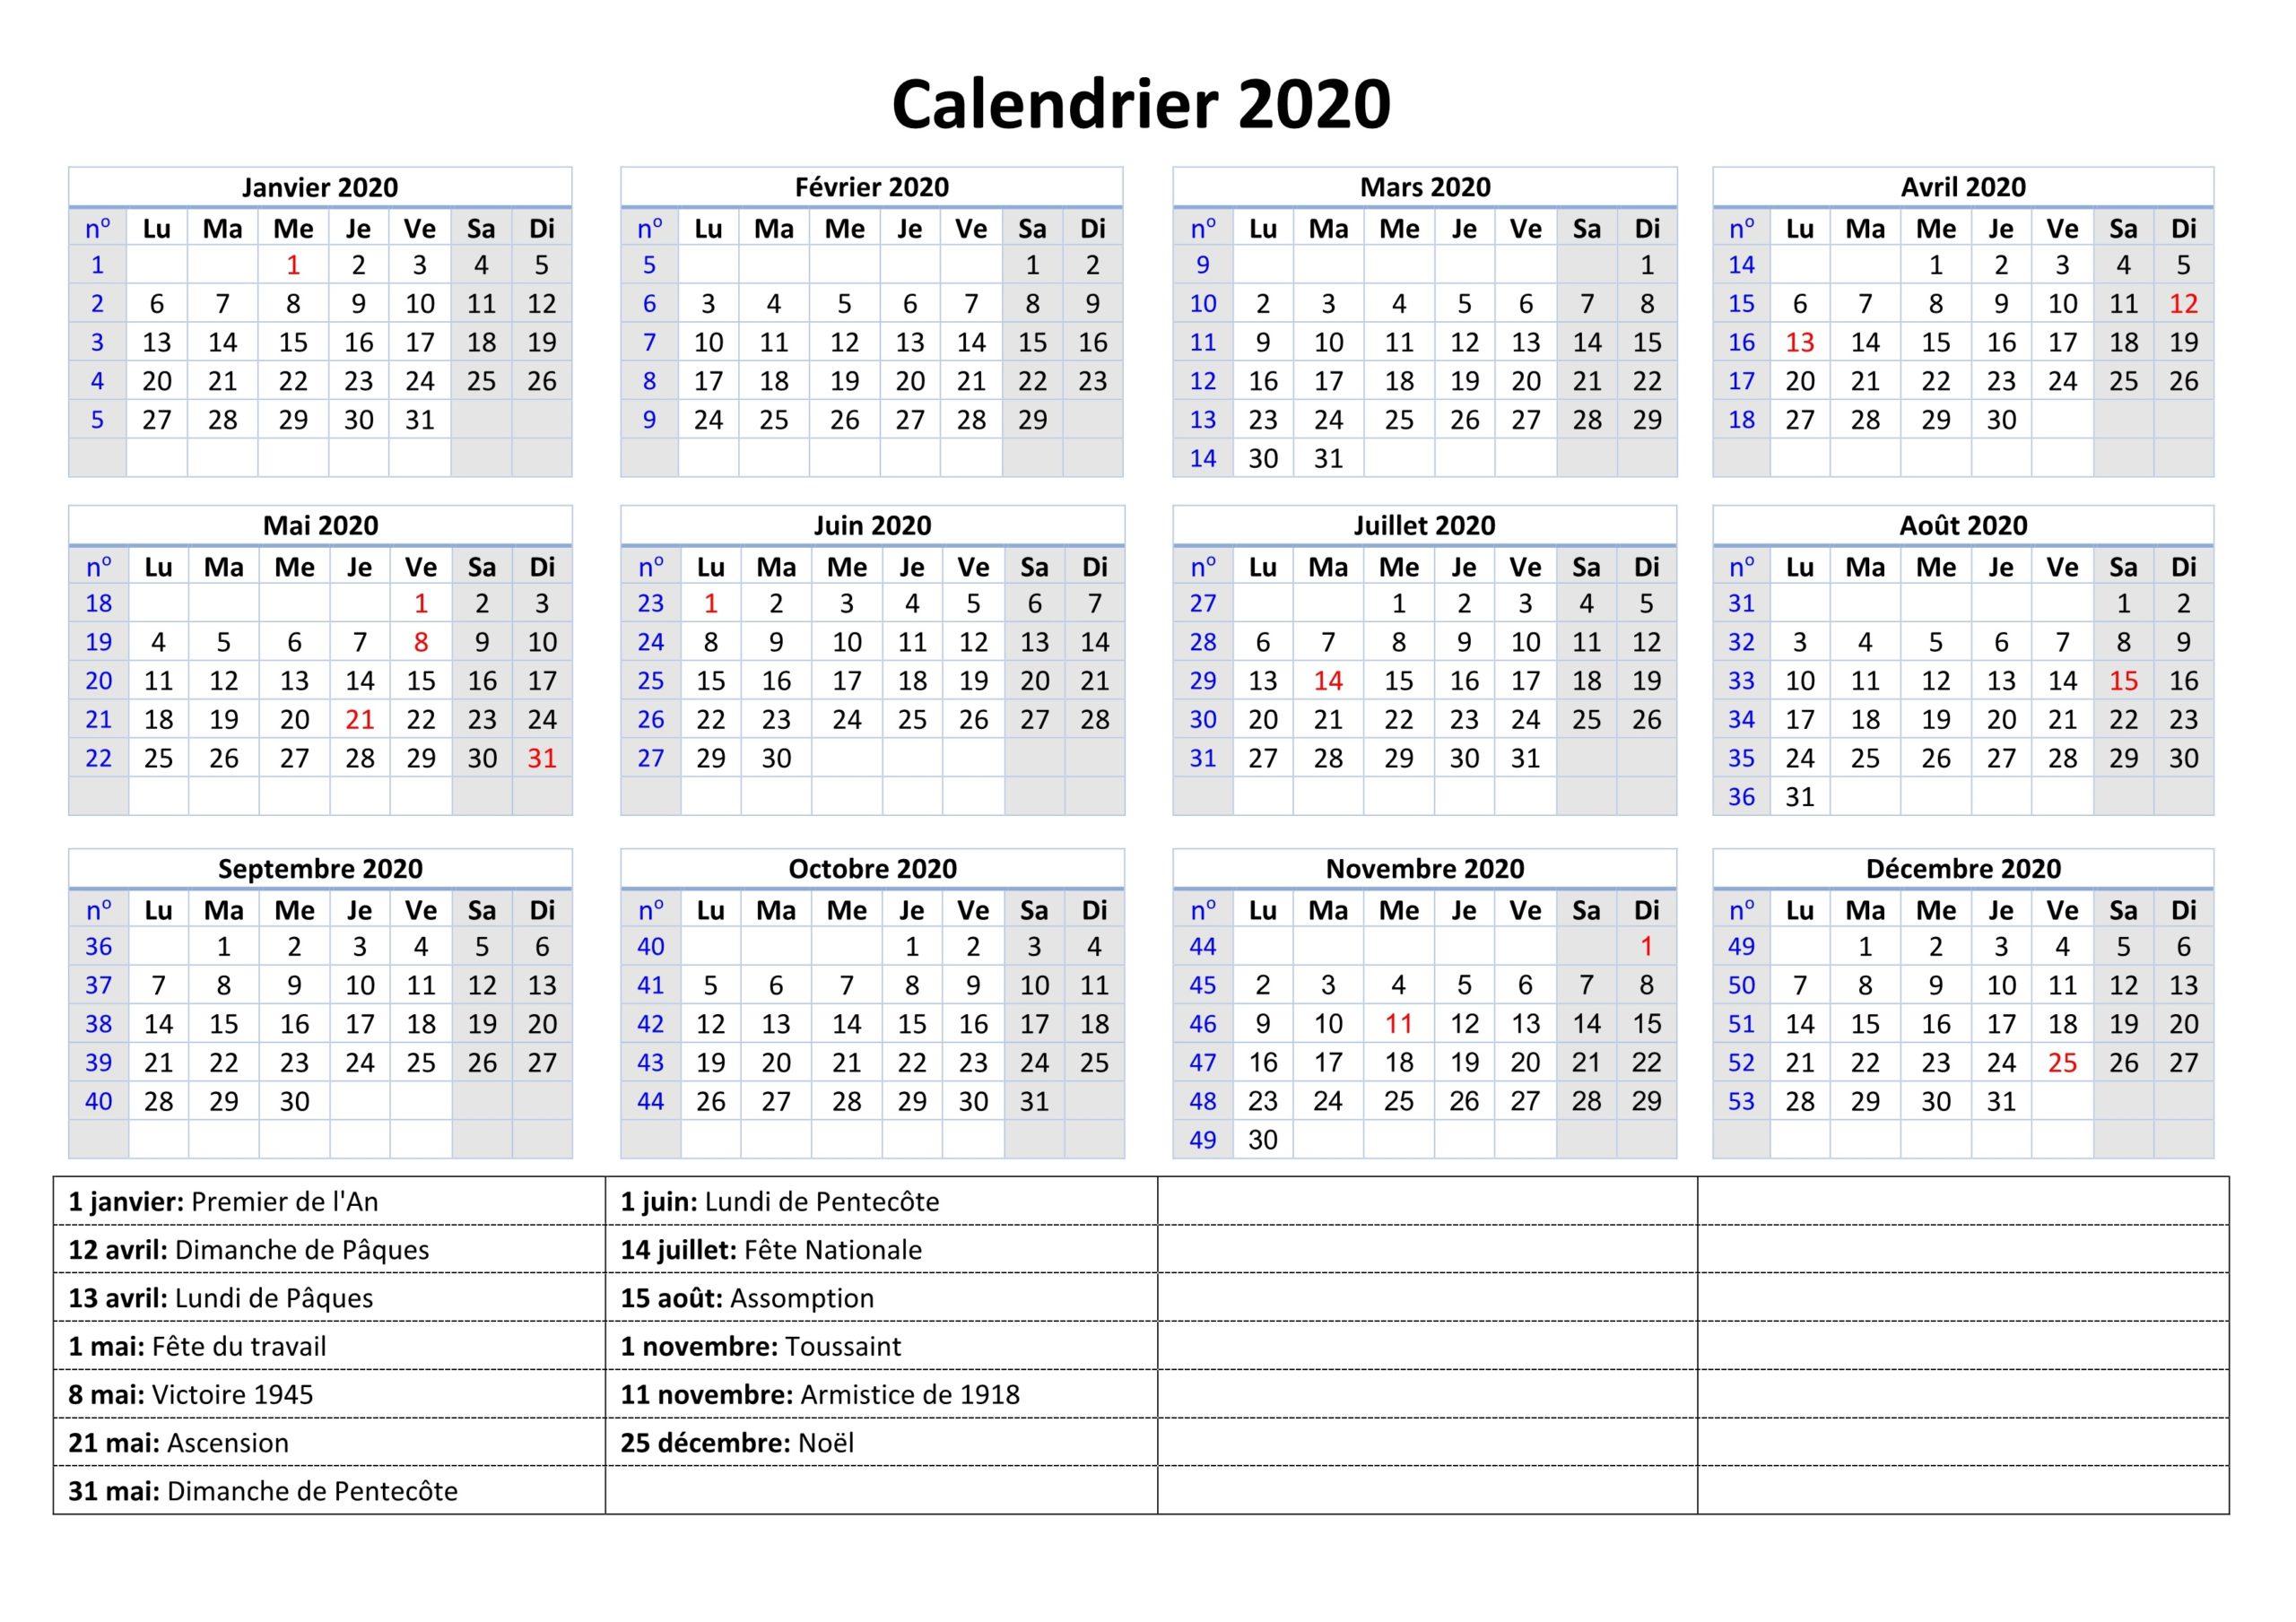 2020 Calendrier Des Fetes